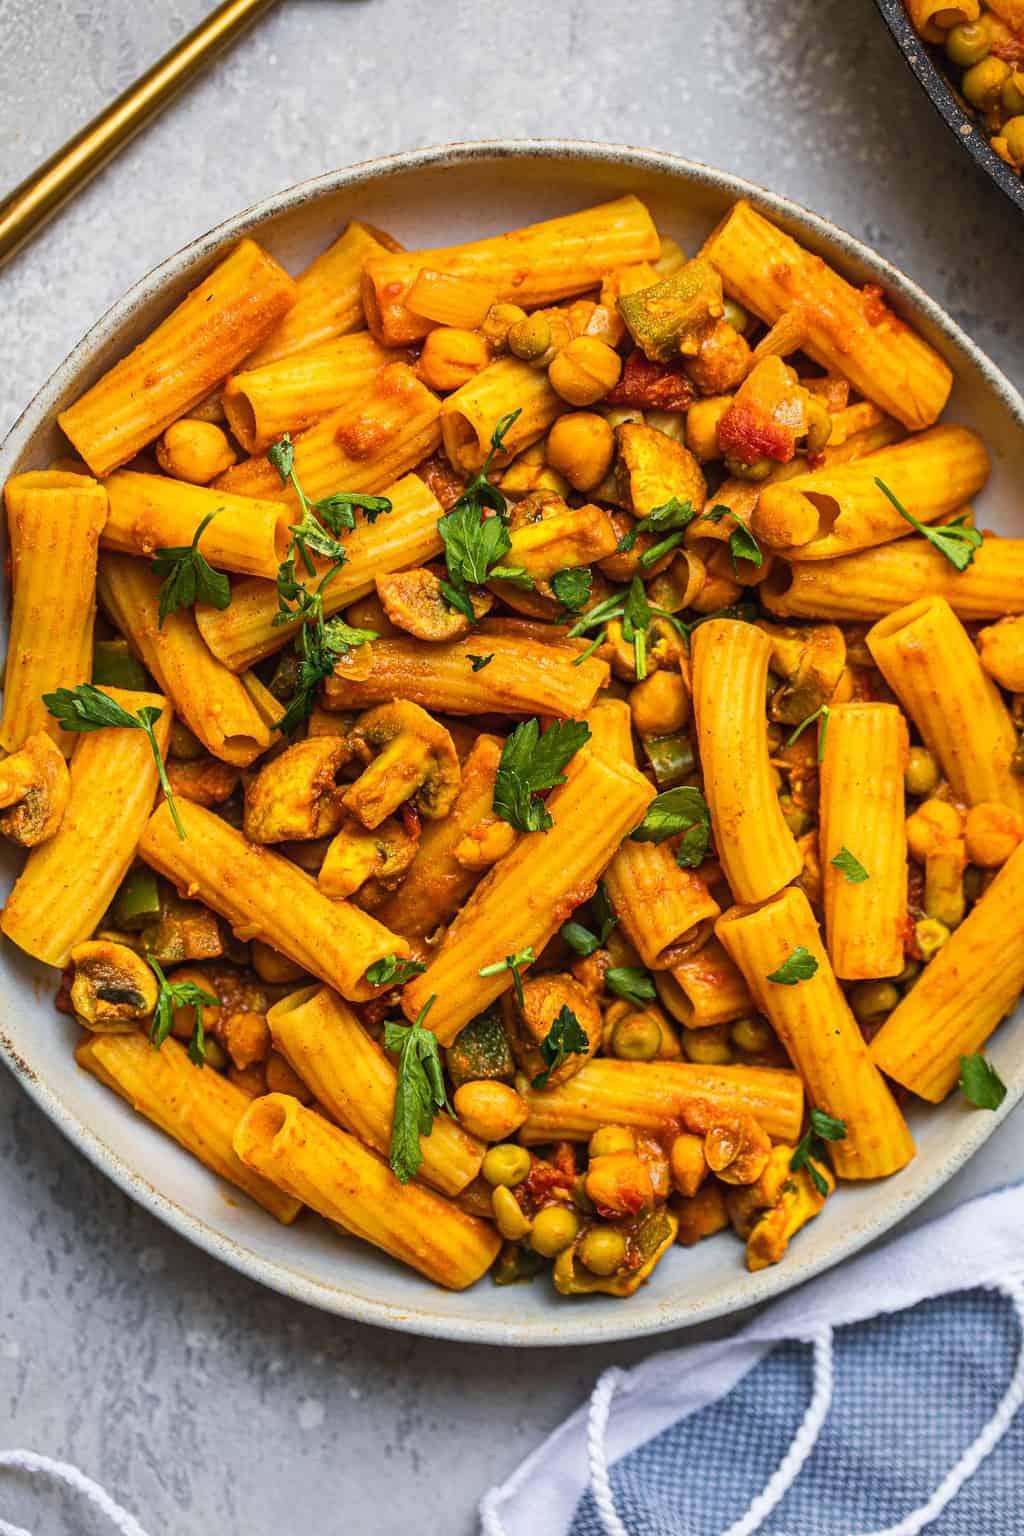 Vegan chickpea pasta with mushrooms gluten-free oil-free